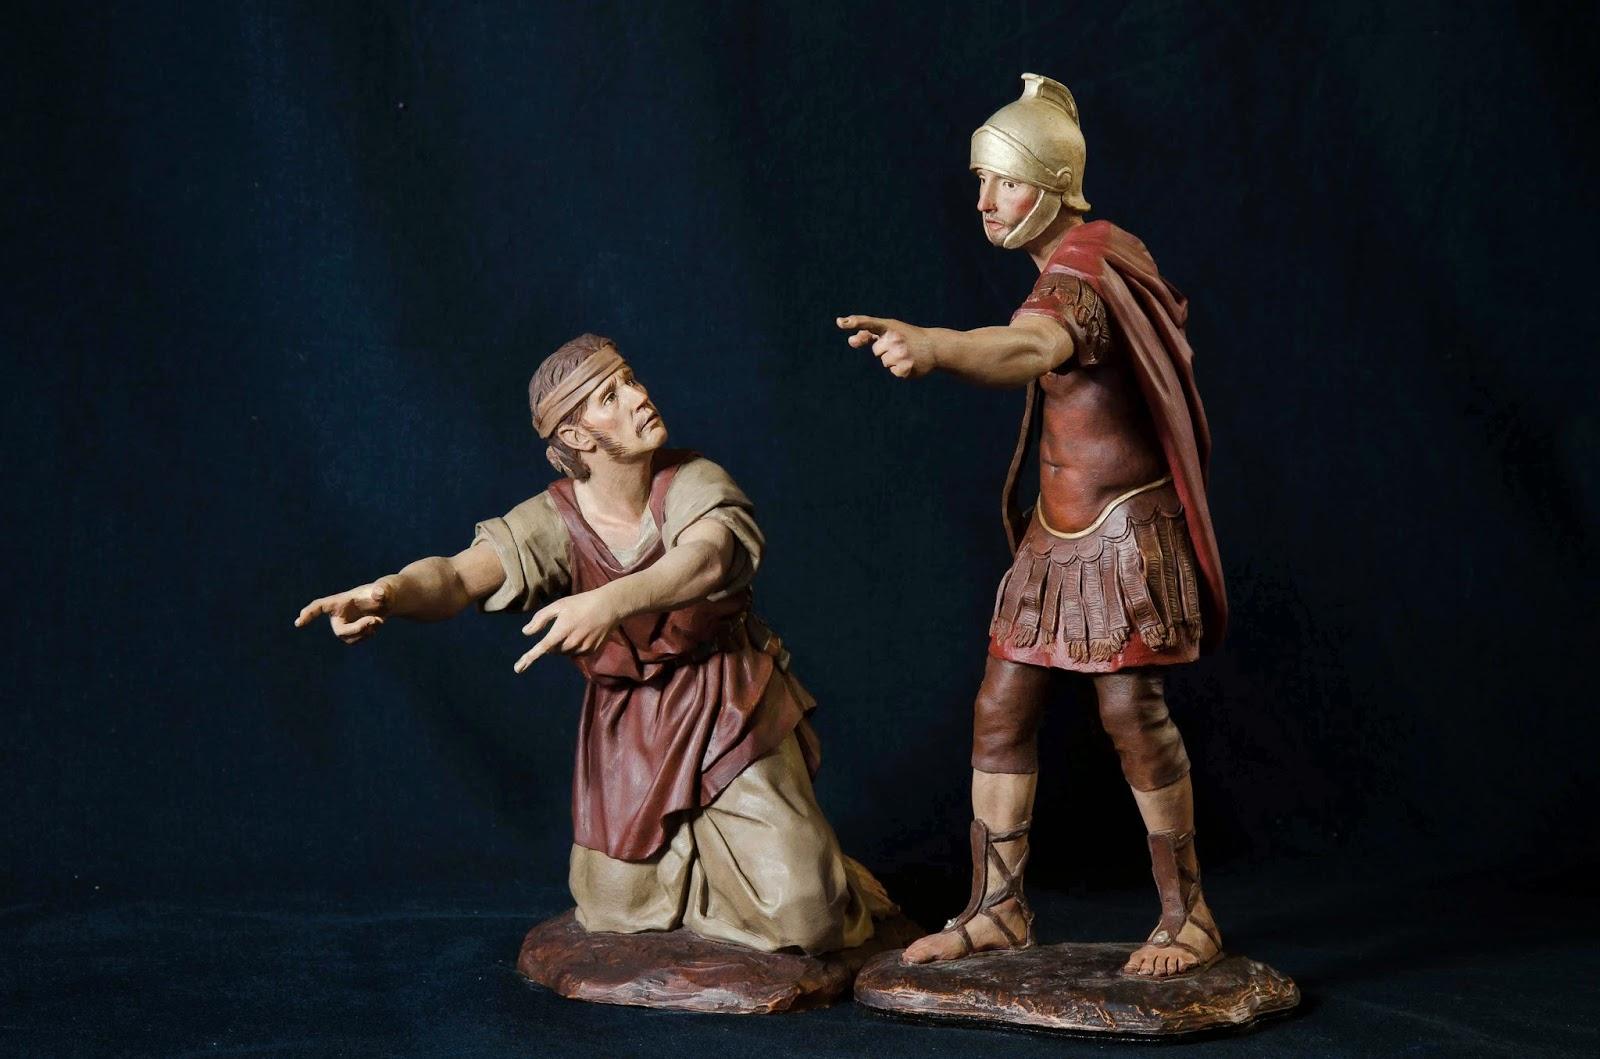 Belén presepe nativity krippe Arturo Serra escultura barro cocido 14